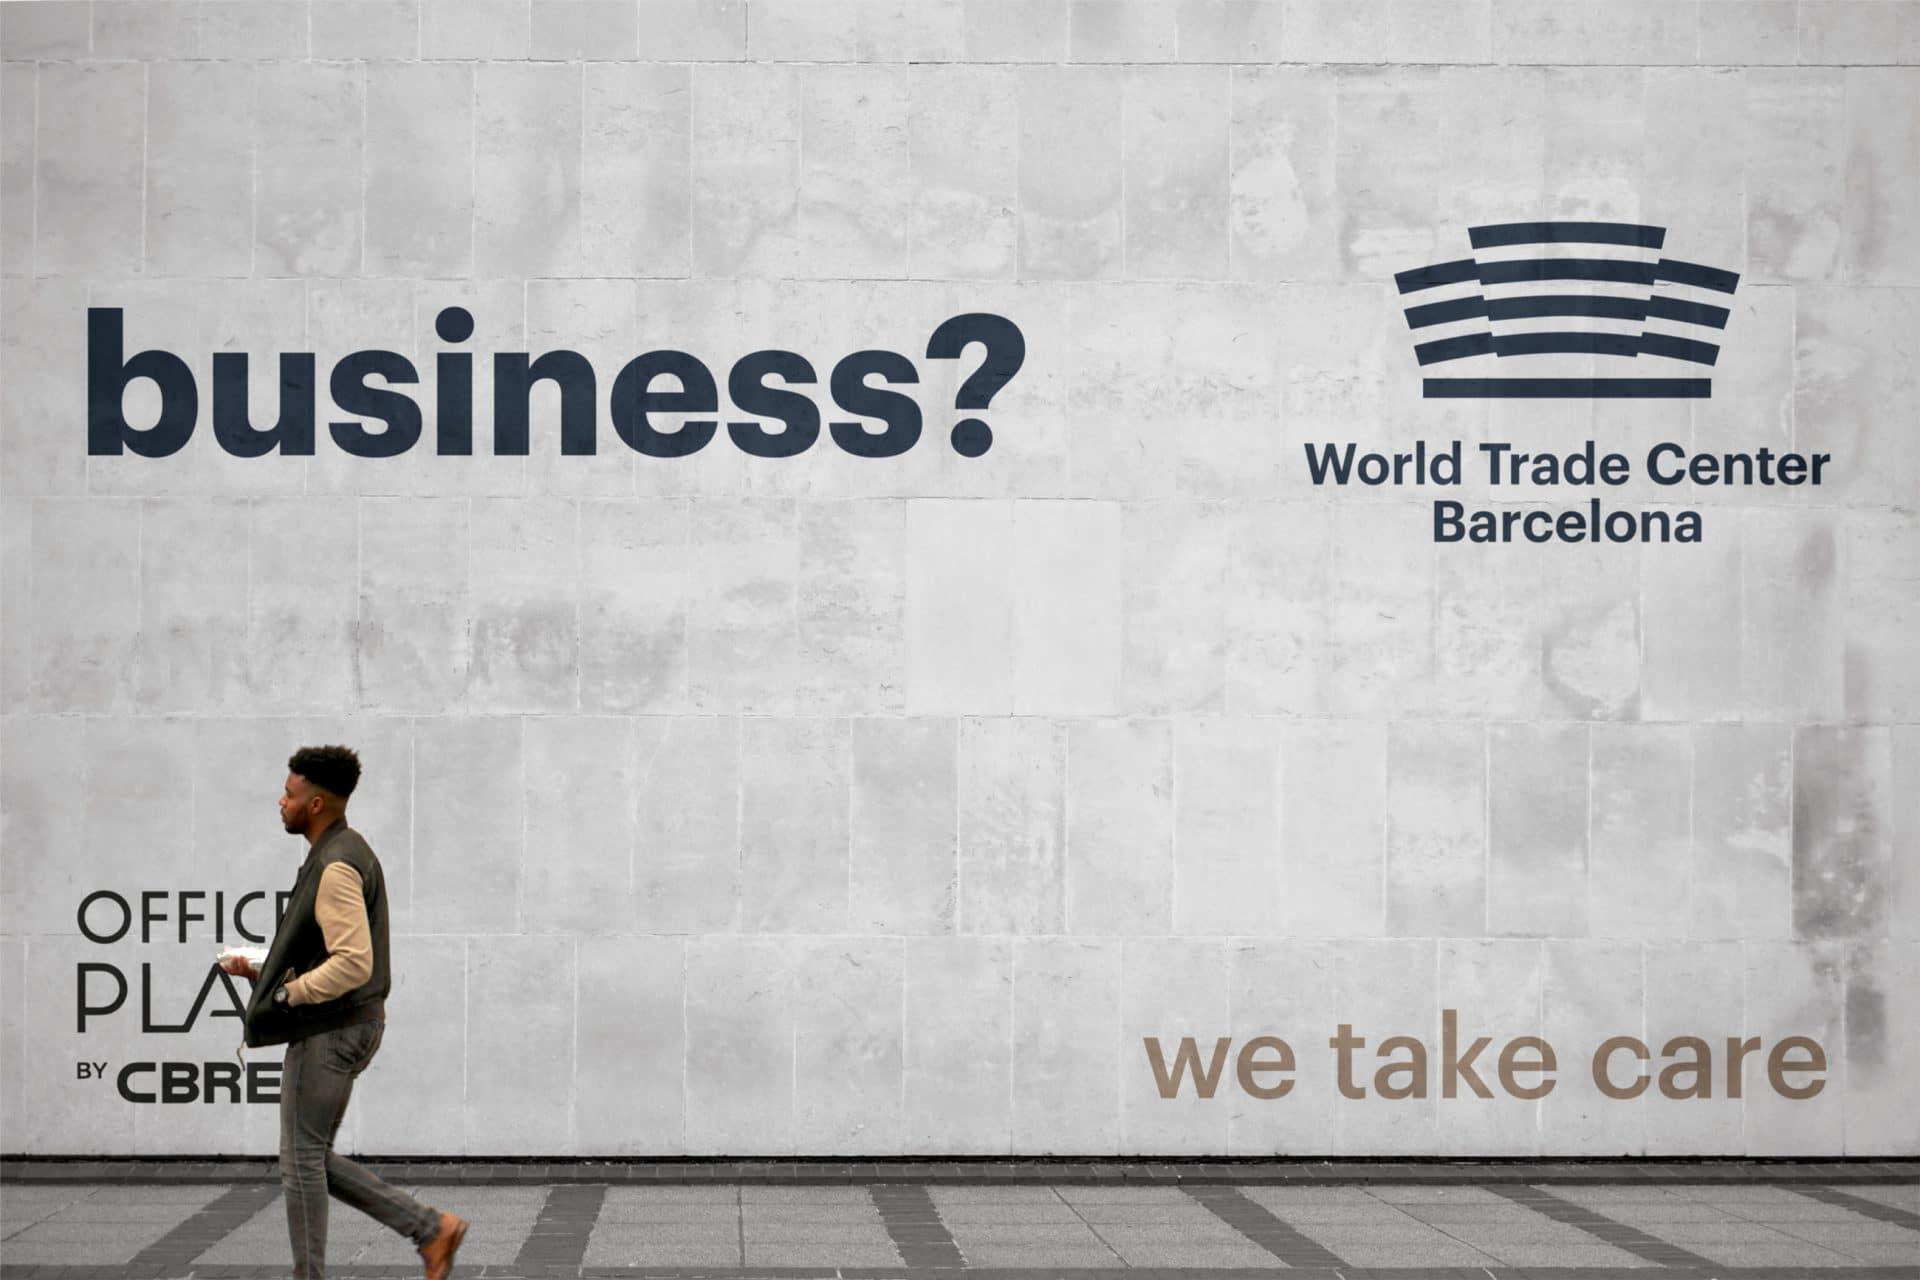 World Trade Center Barcelona